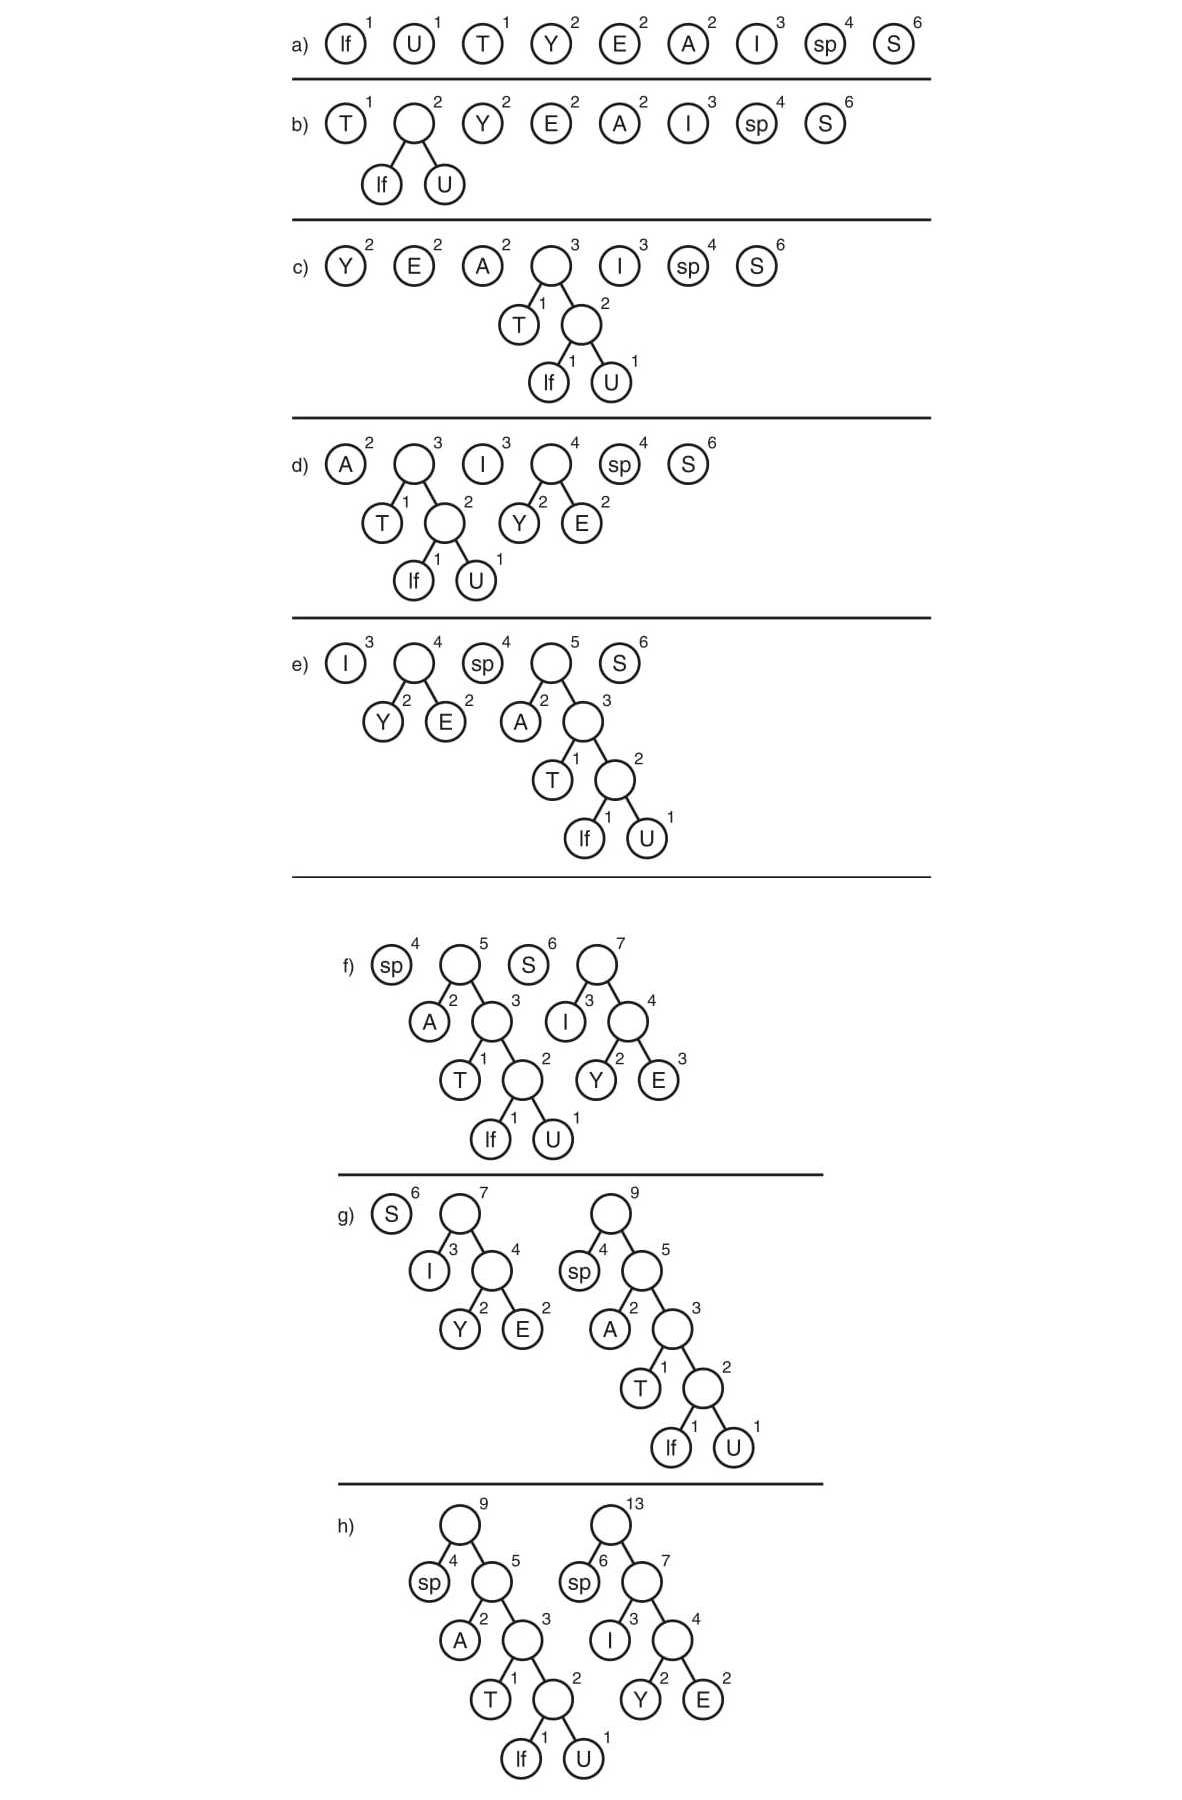 Сжатие данных алгоритмом Хаффмана - 3